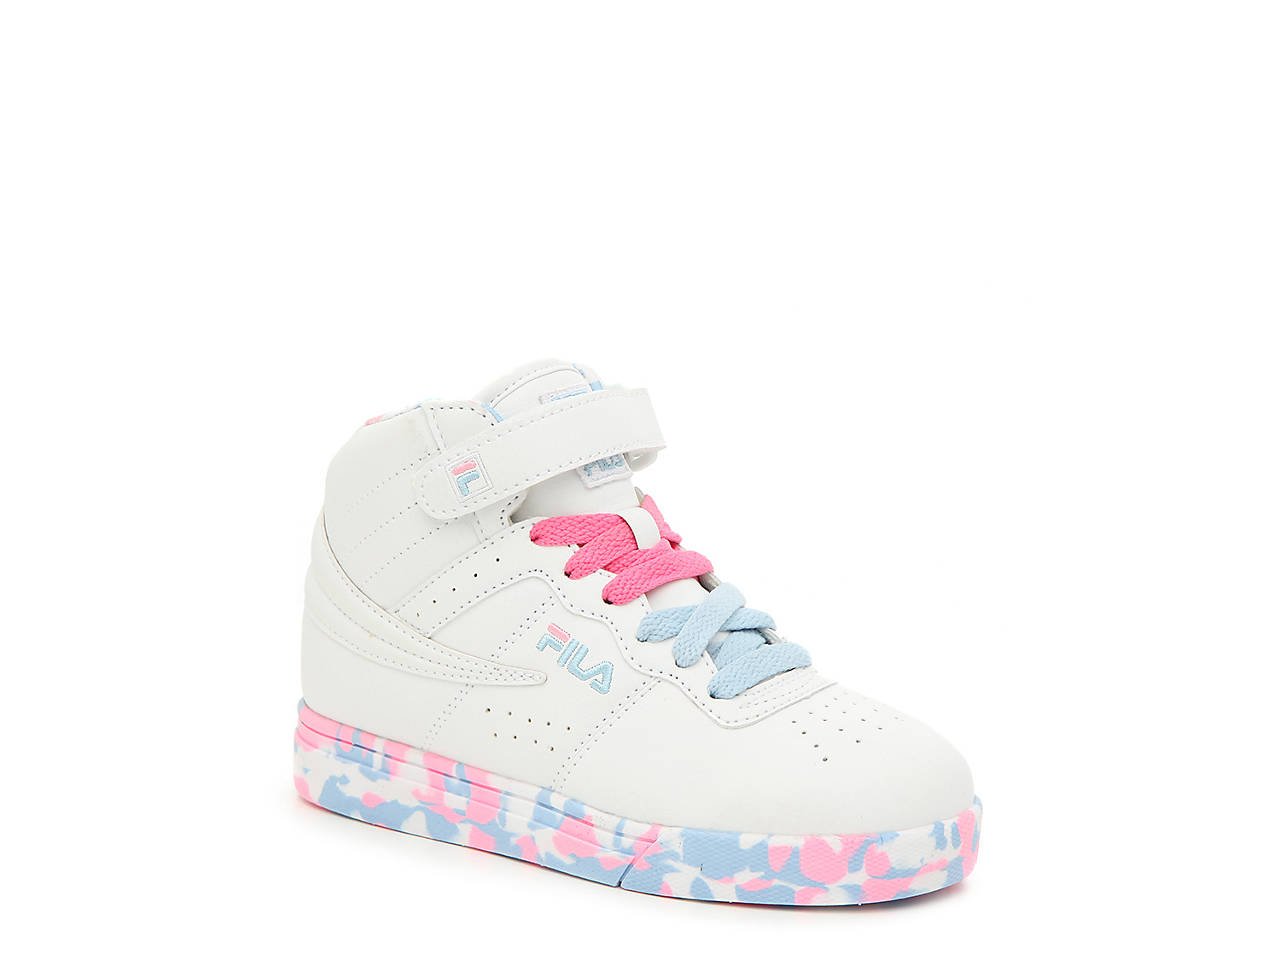 21c7d6ef42bf Fila Vulc 3 Mashup Toddler   Youth High-Top Sneaker Kids Shoes